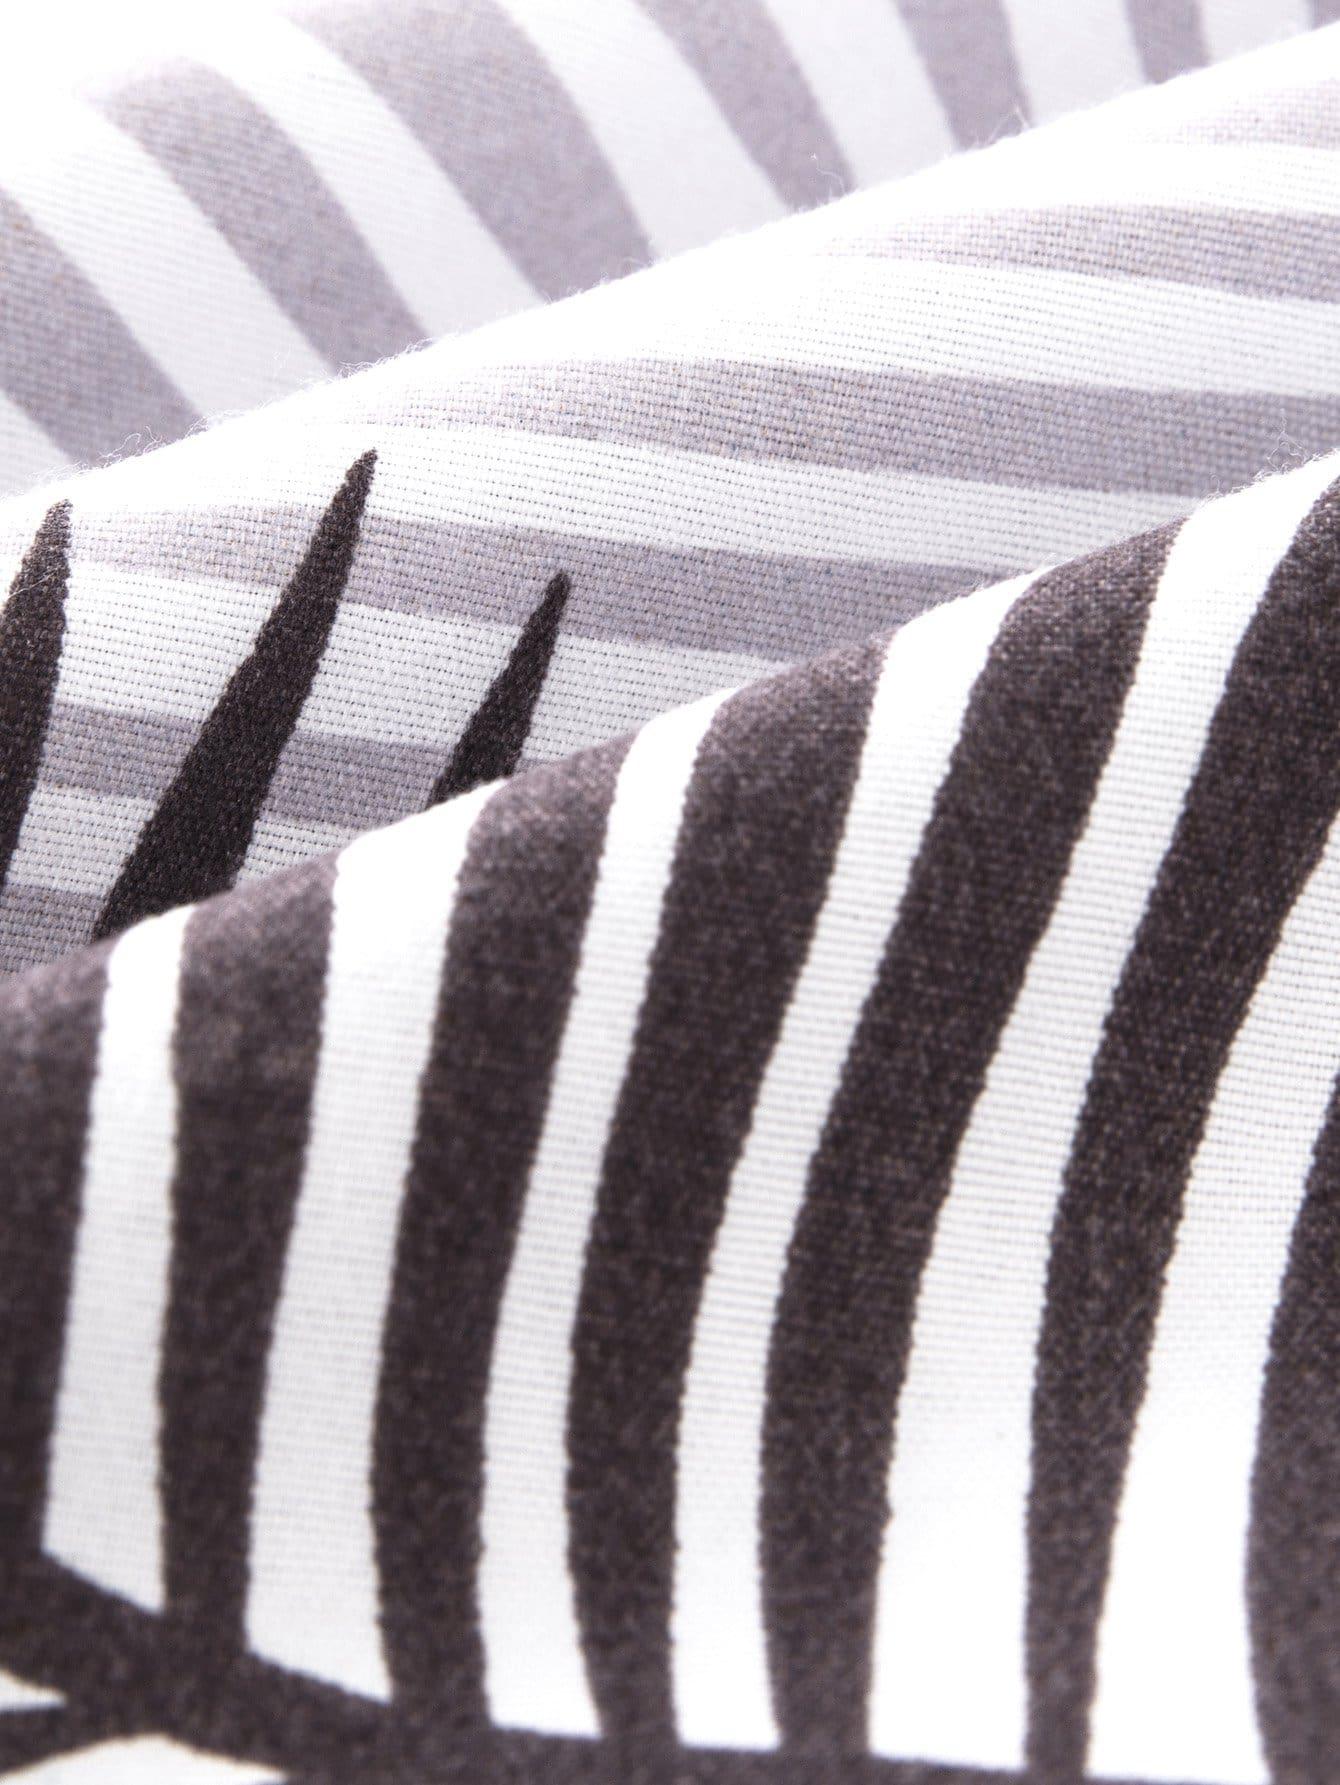 bettlaken set mit stamm muster german shein sheinside. Black Bedroom Furniture Sets. Home Design Ideas